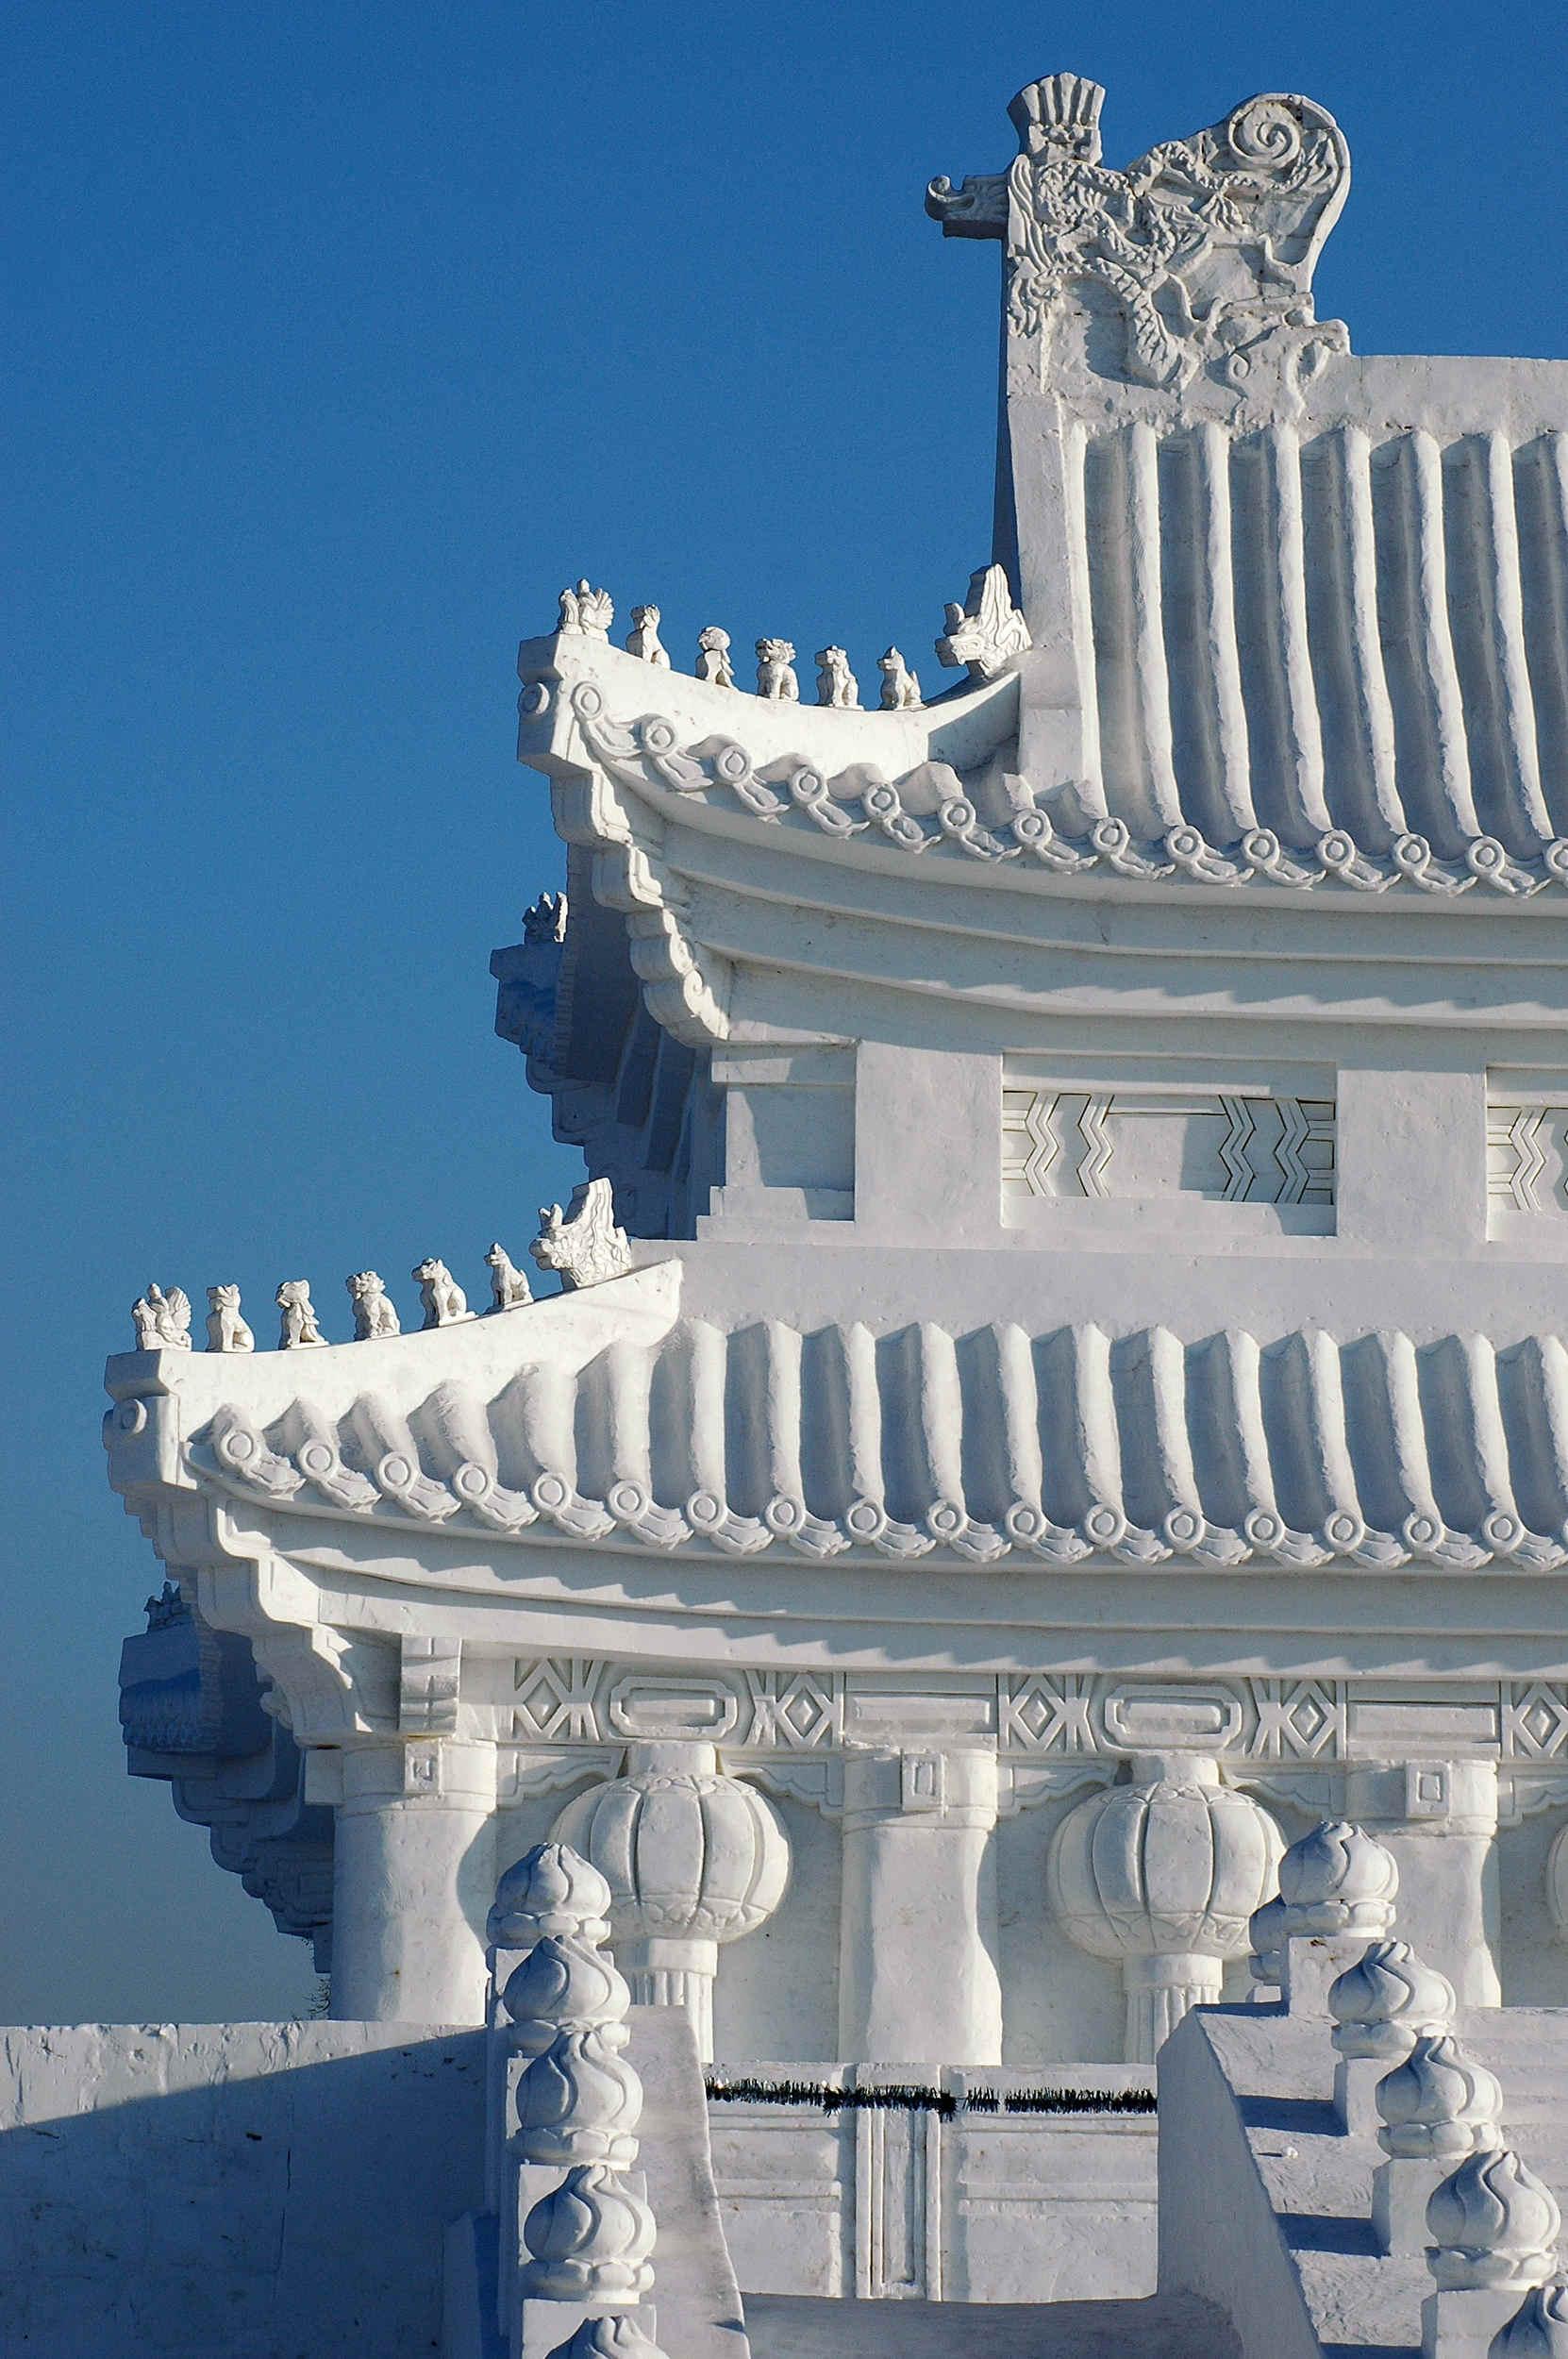 Harbin Snow and Ice Festival, China